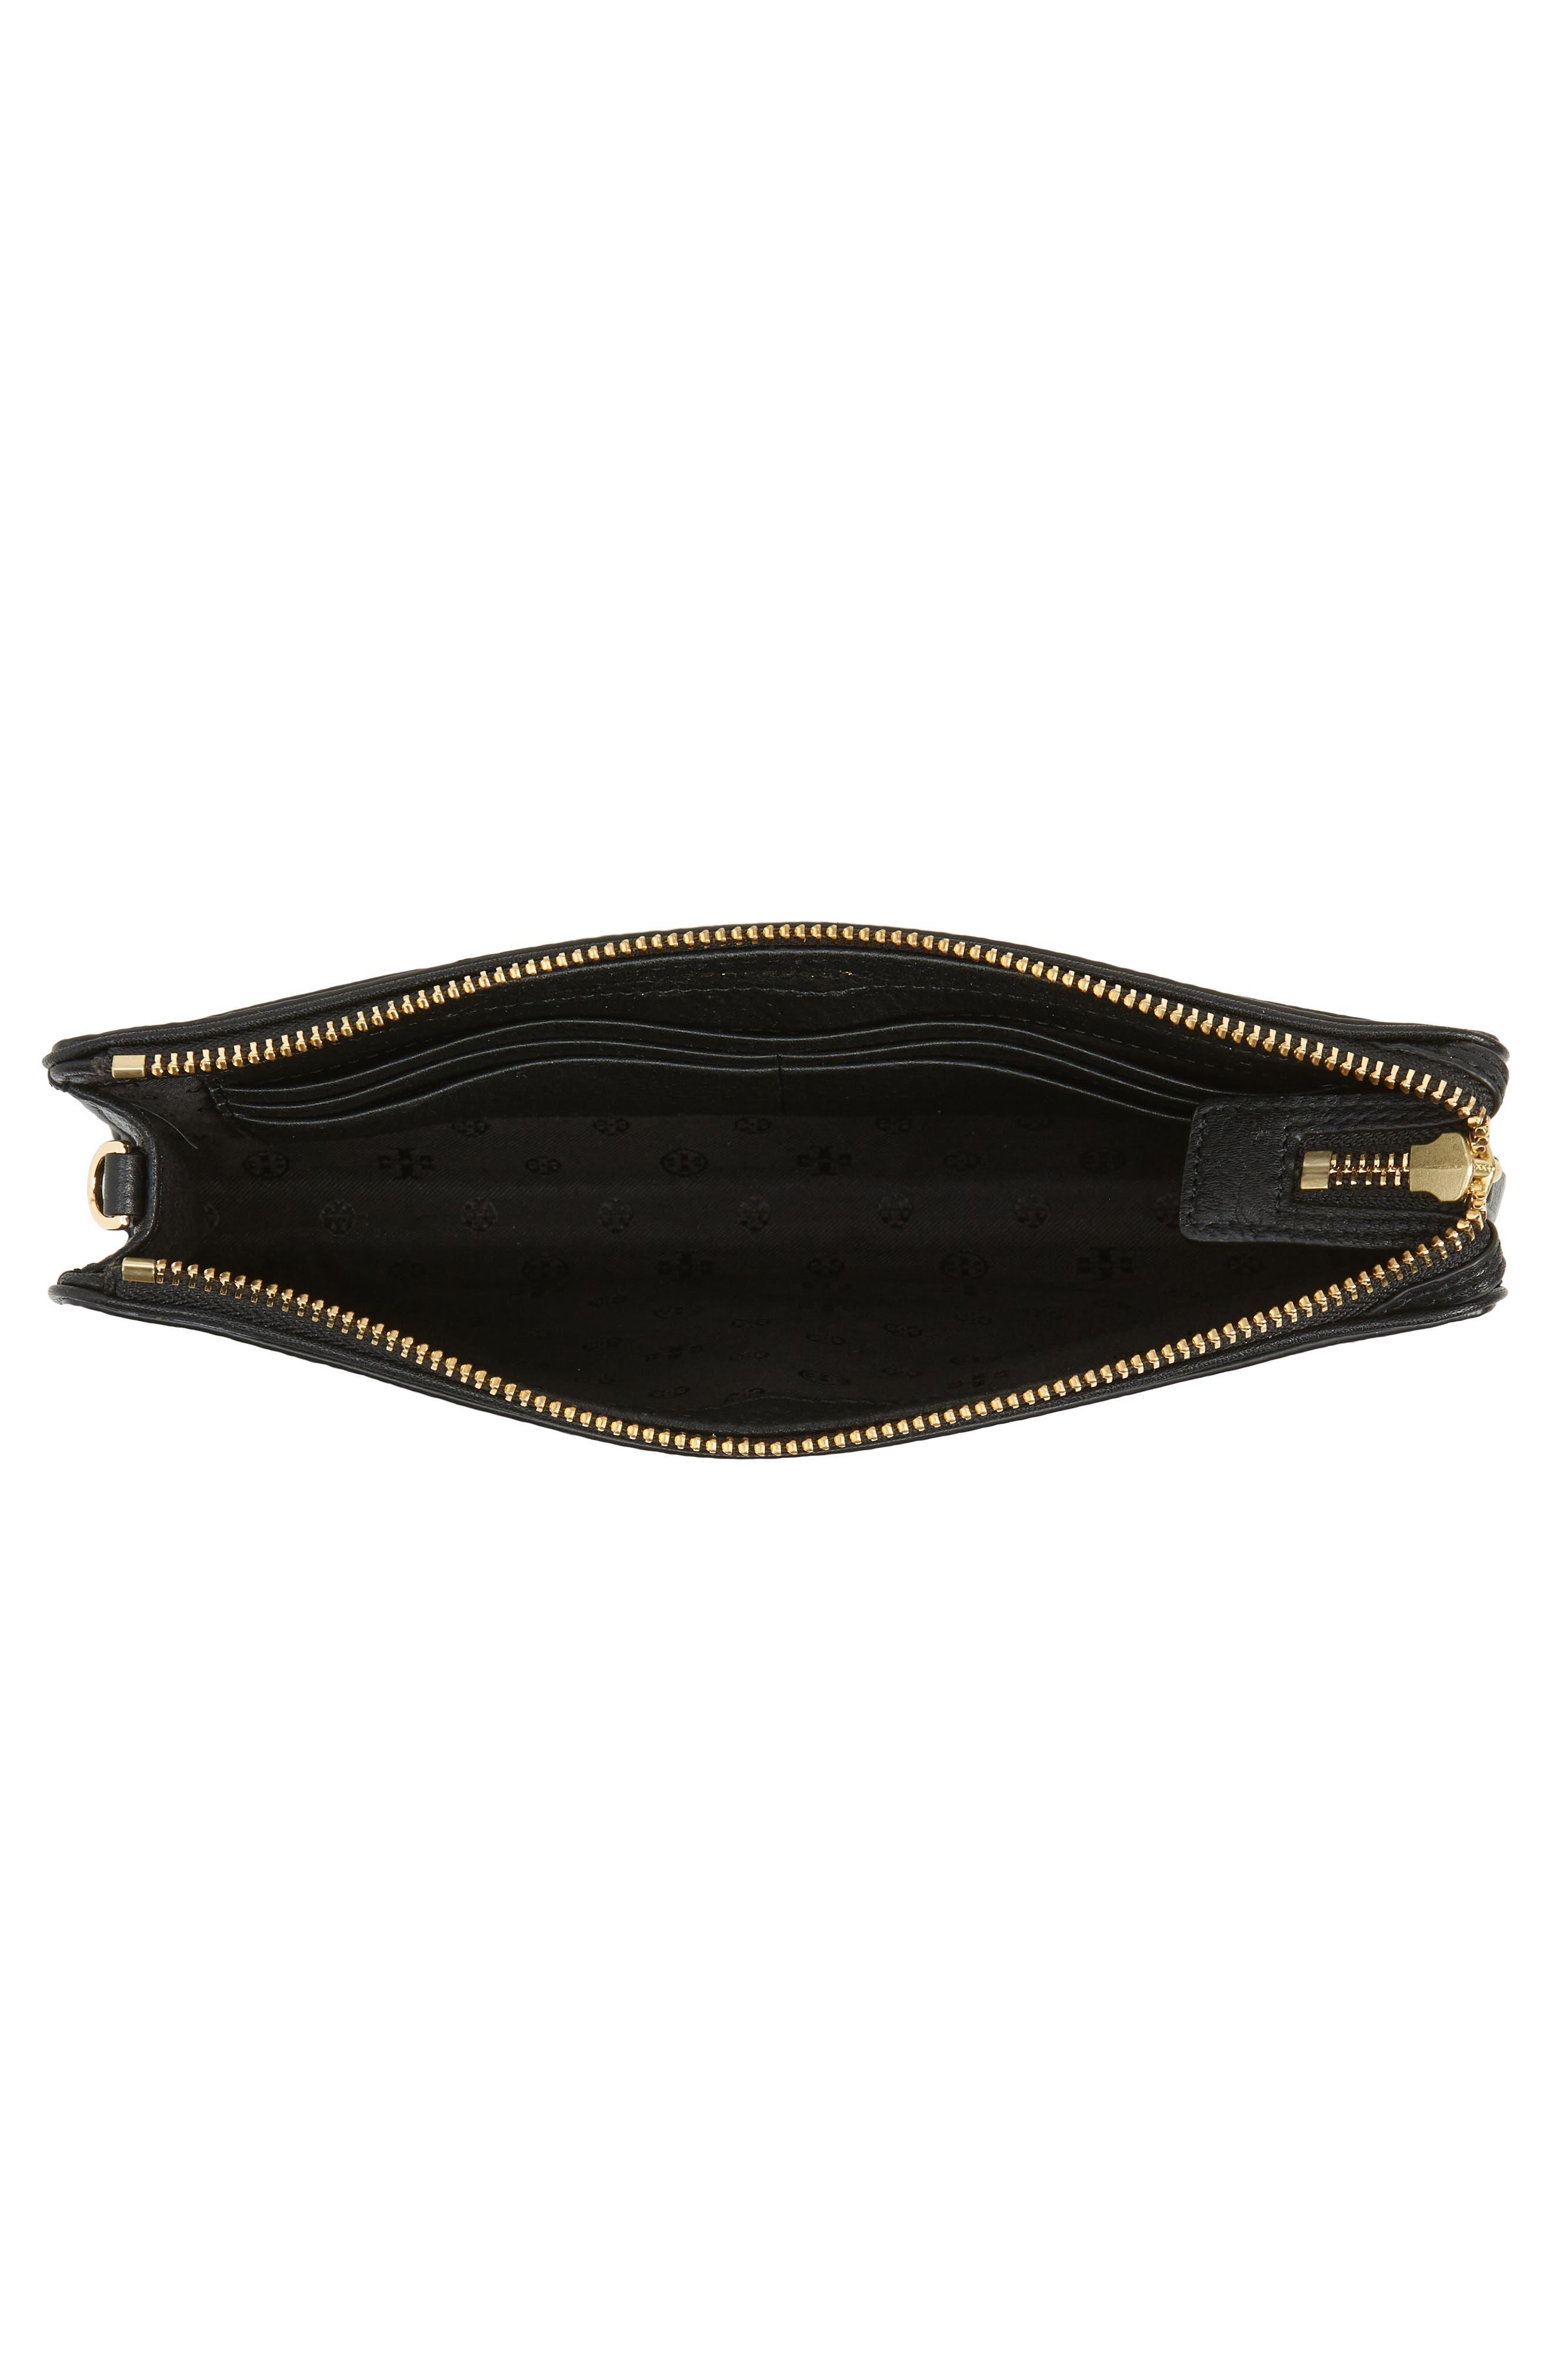 Marsden Leather Wallet Crossbody Bag,                             Alternate thumbnail 4, color,                             Black